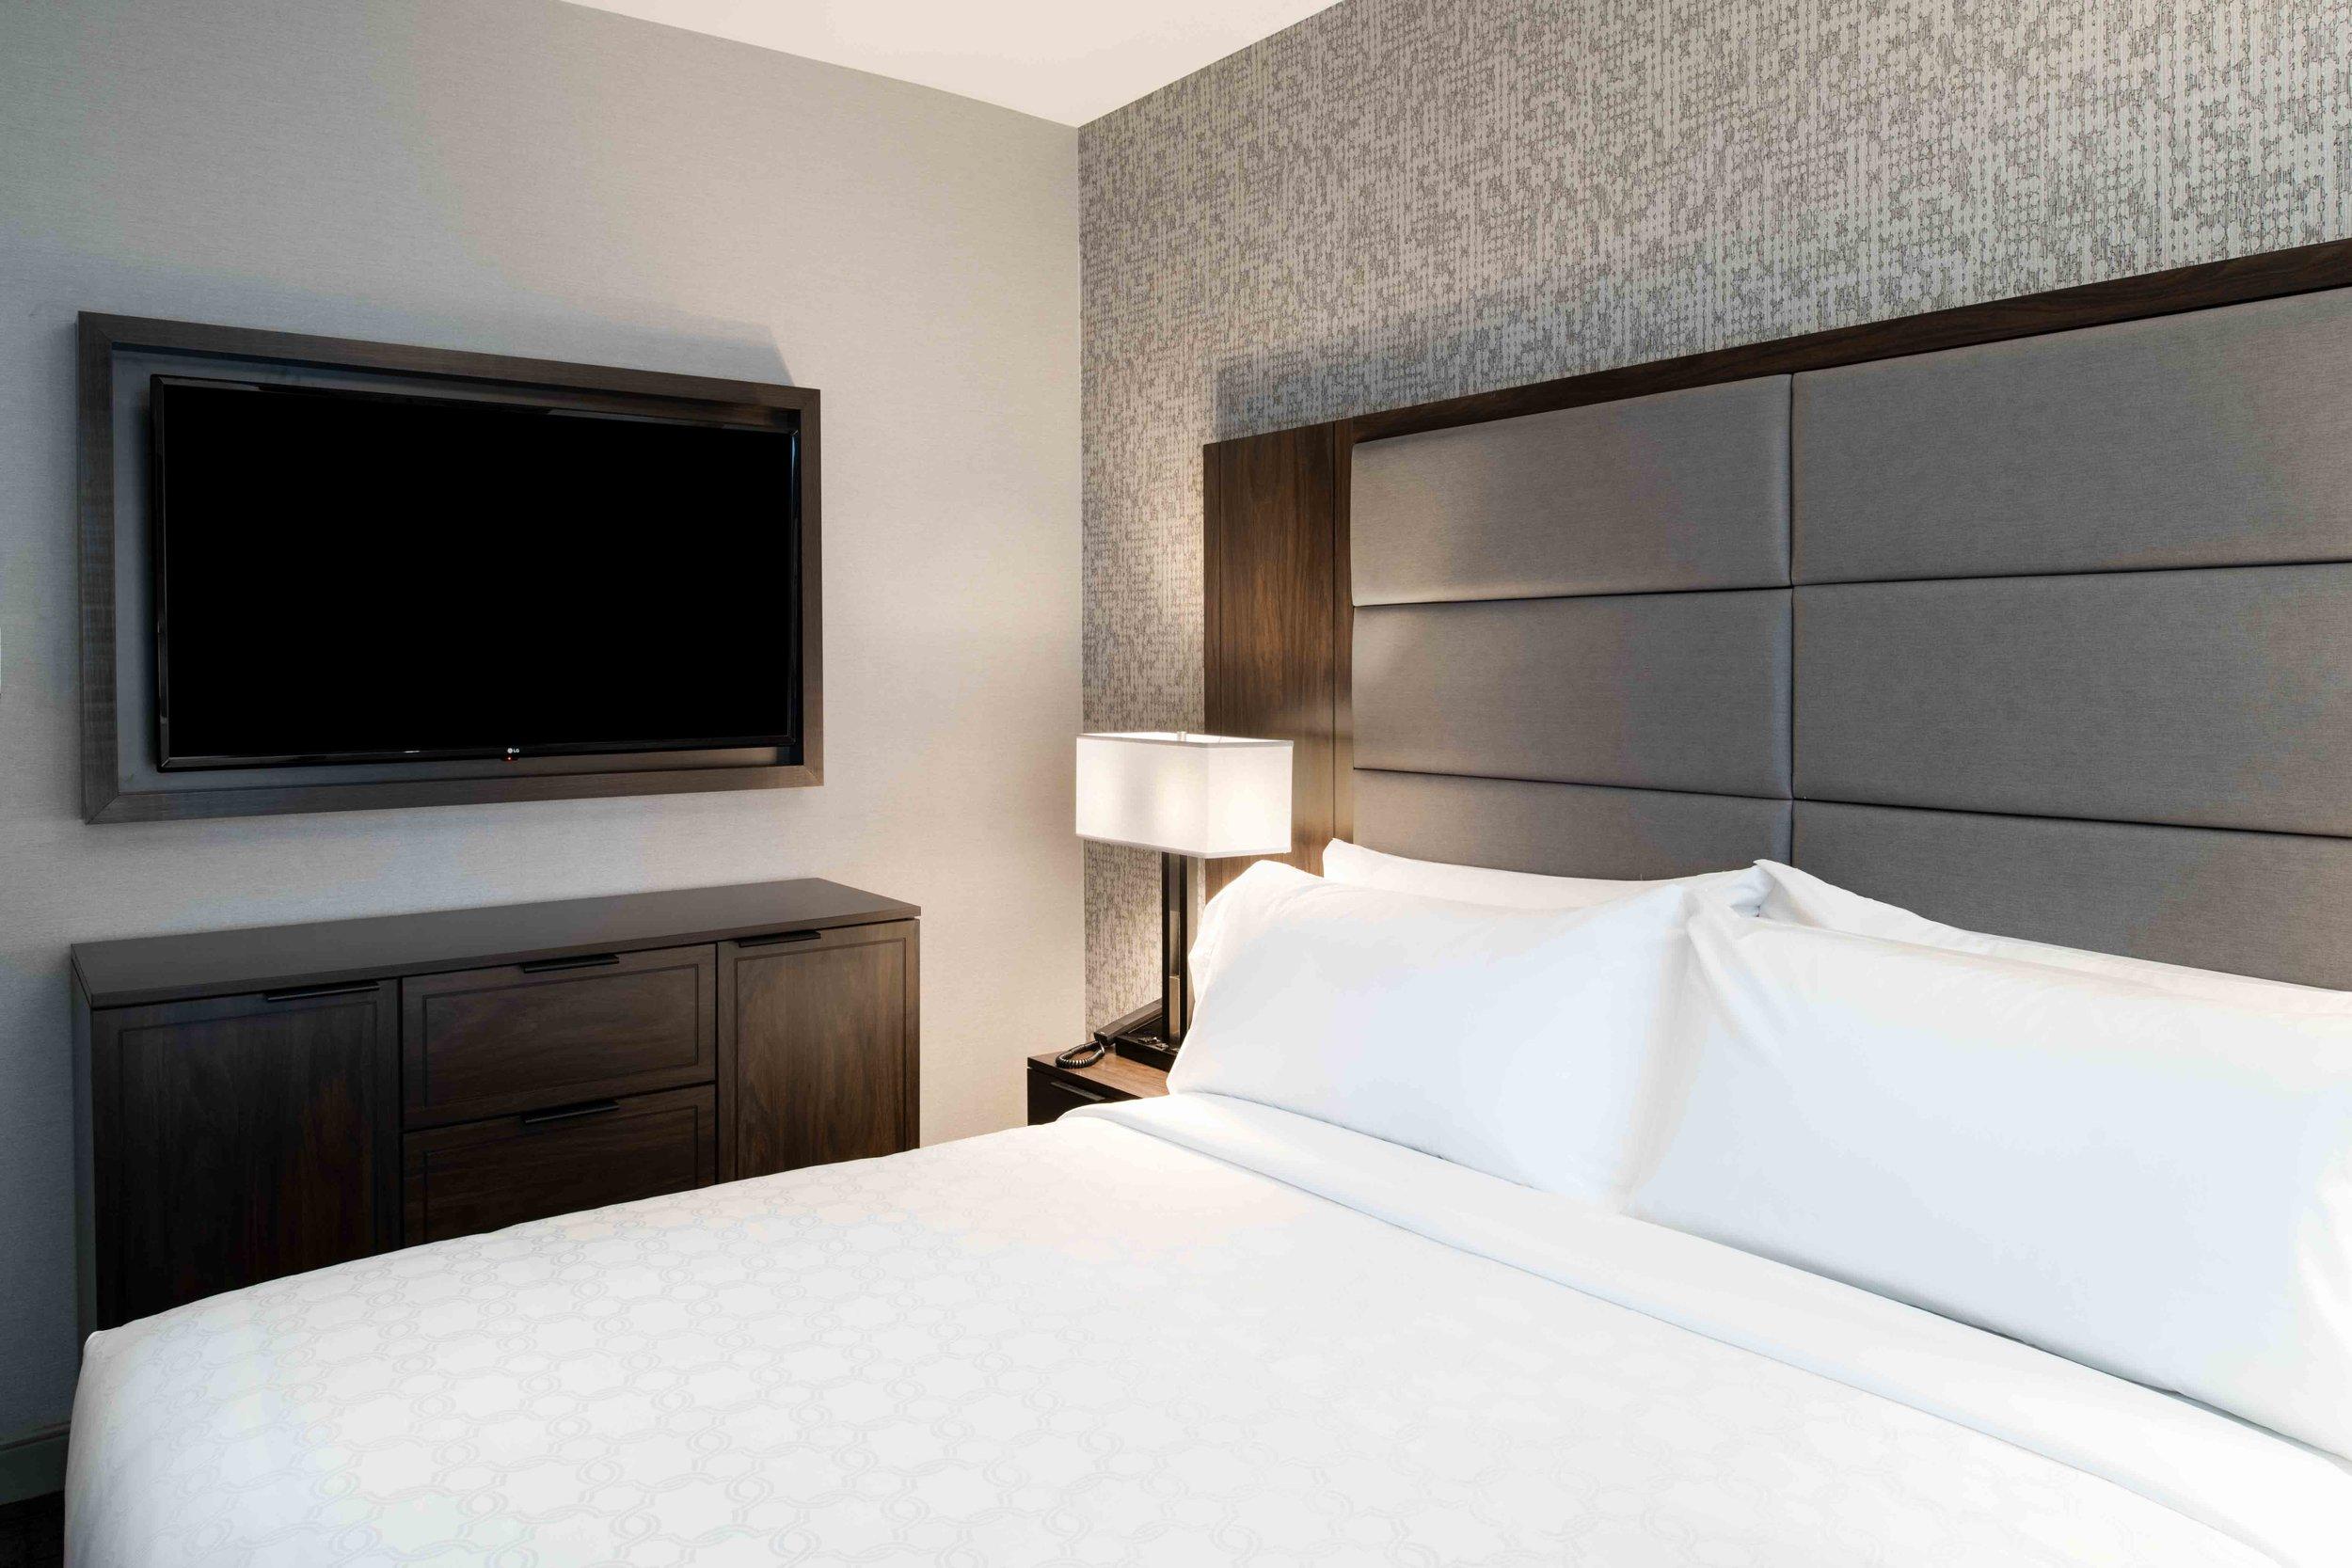 Staybridge Suites King Bed